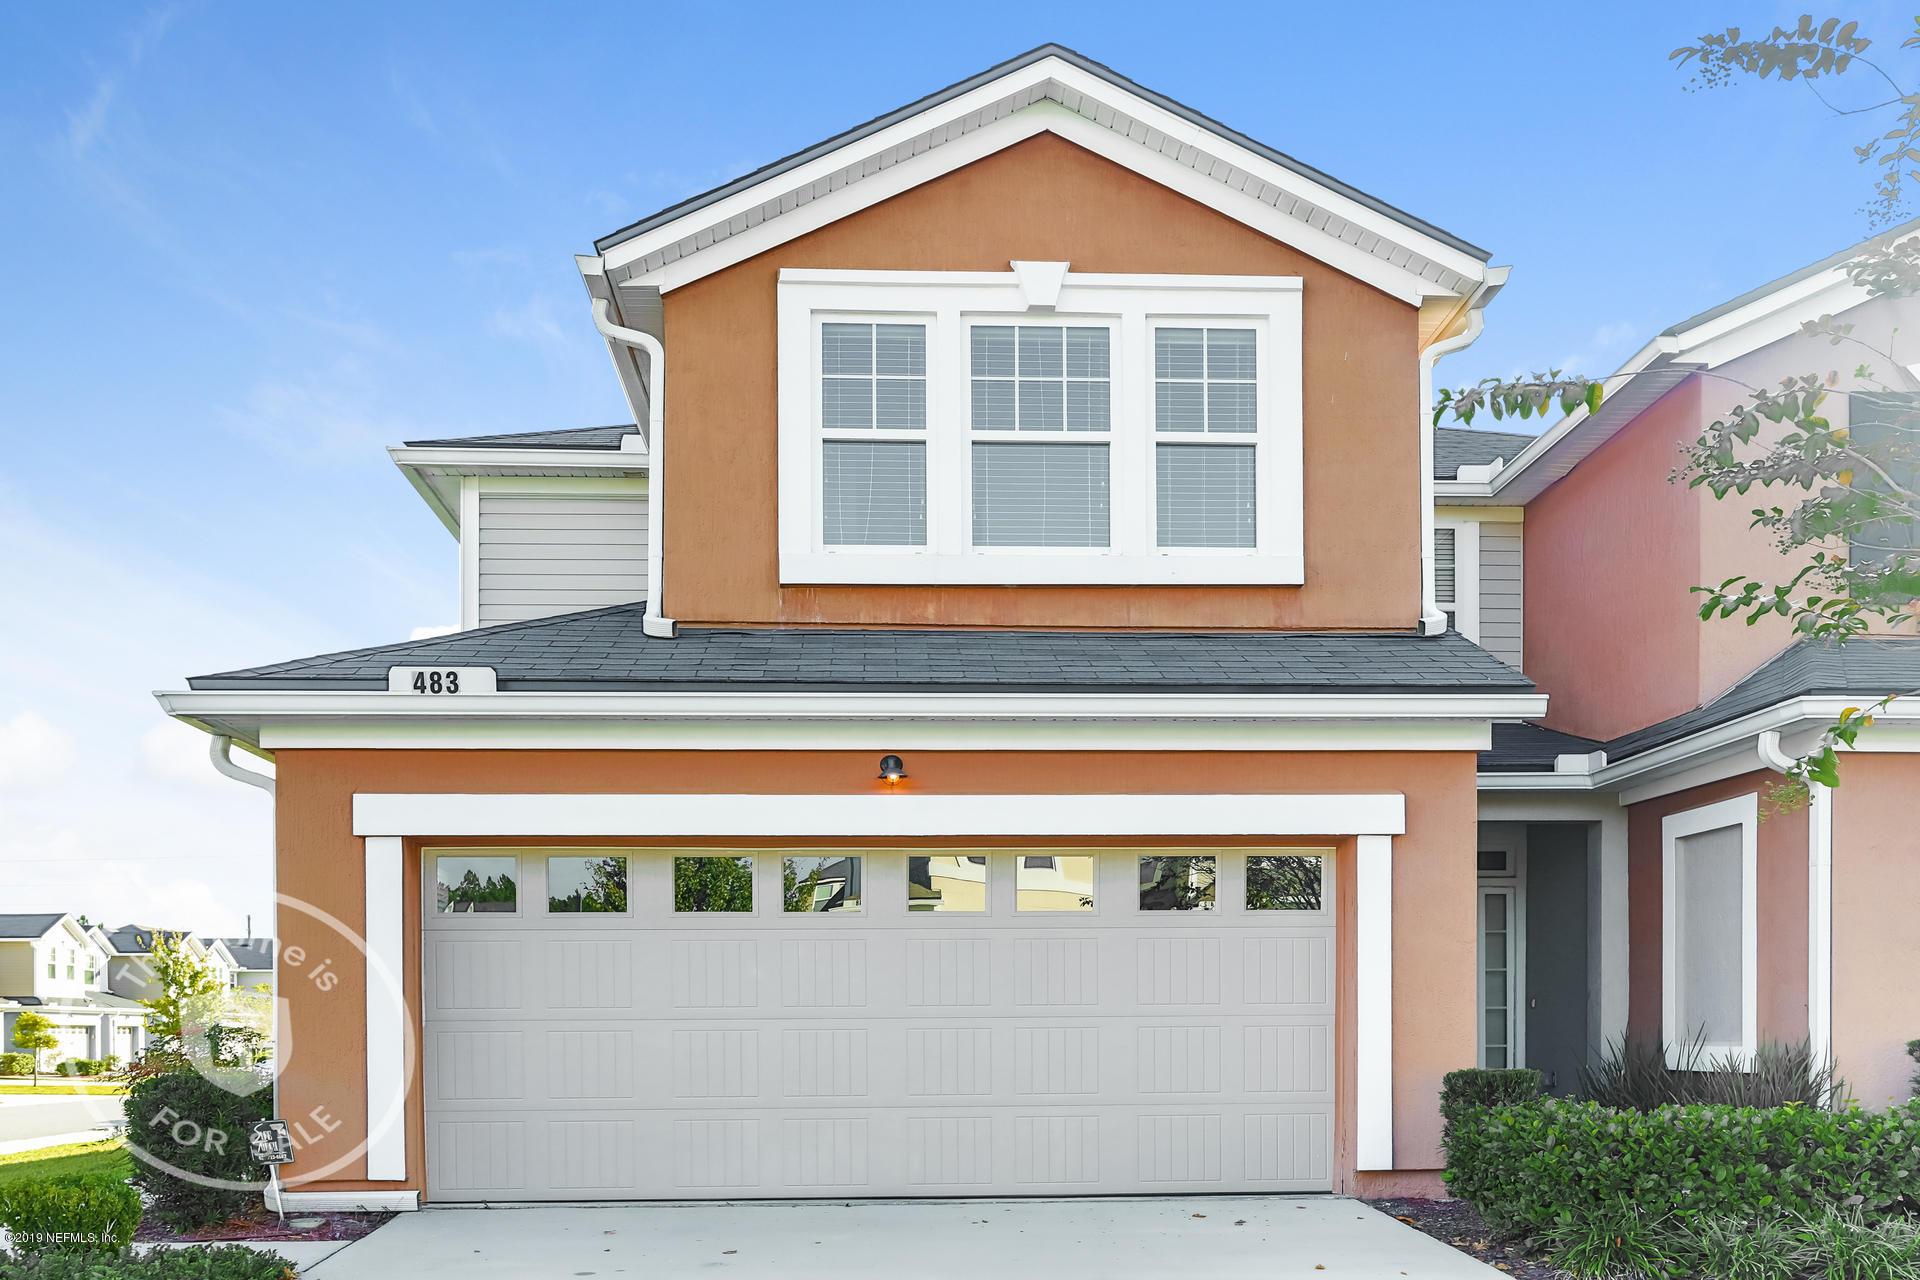 483 RYKER, ORANGE PARK, FLORIDA 32065, 3 Bedrooms Bedrooms, ,2 BathroomsBathrooms,Residential - townhome,For sale,RYKER,1022668